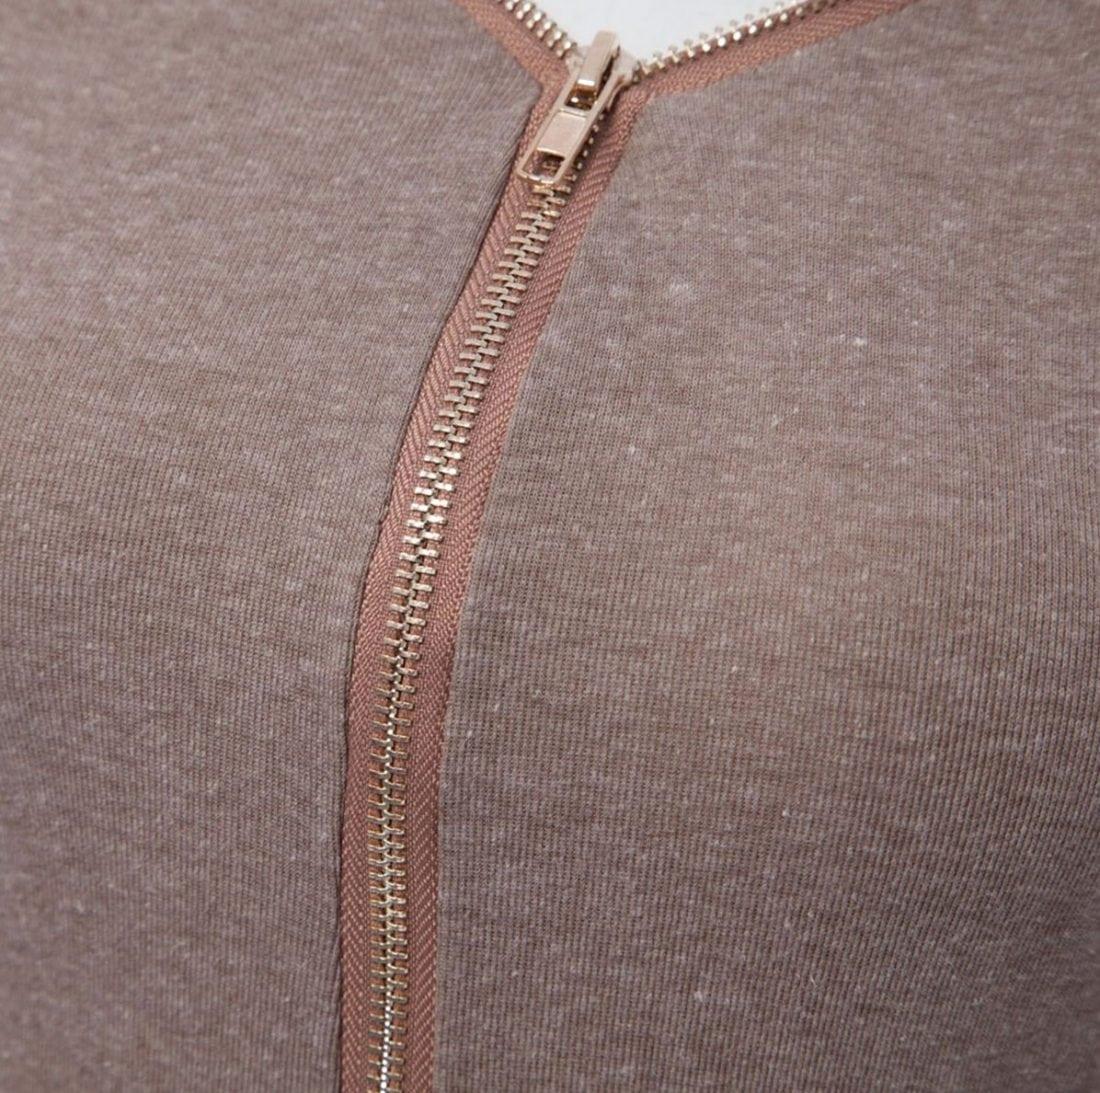 M0183 gray4 Long Sleeve Dresses maureens.com boutique